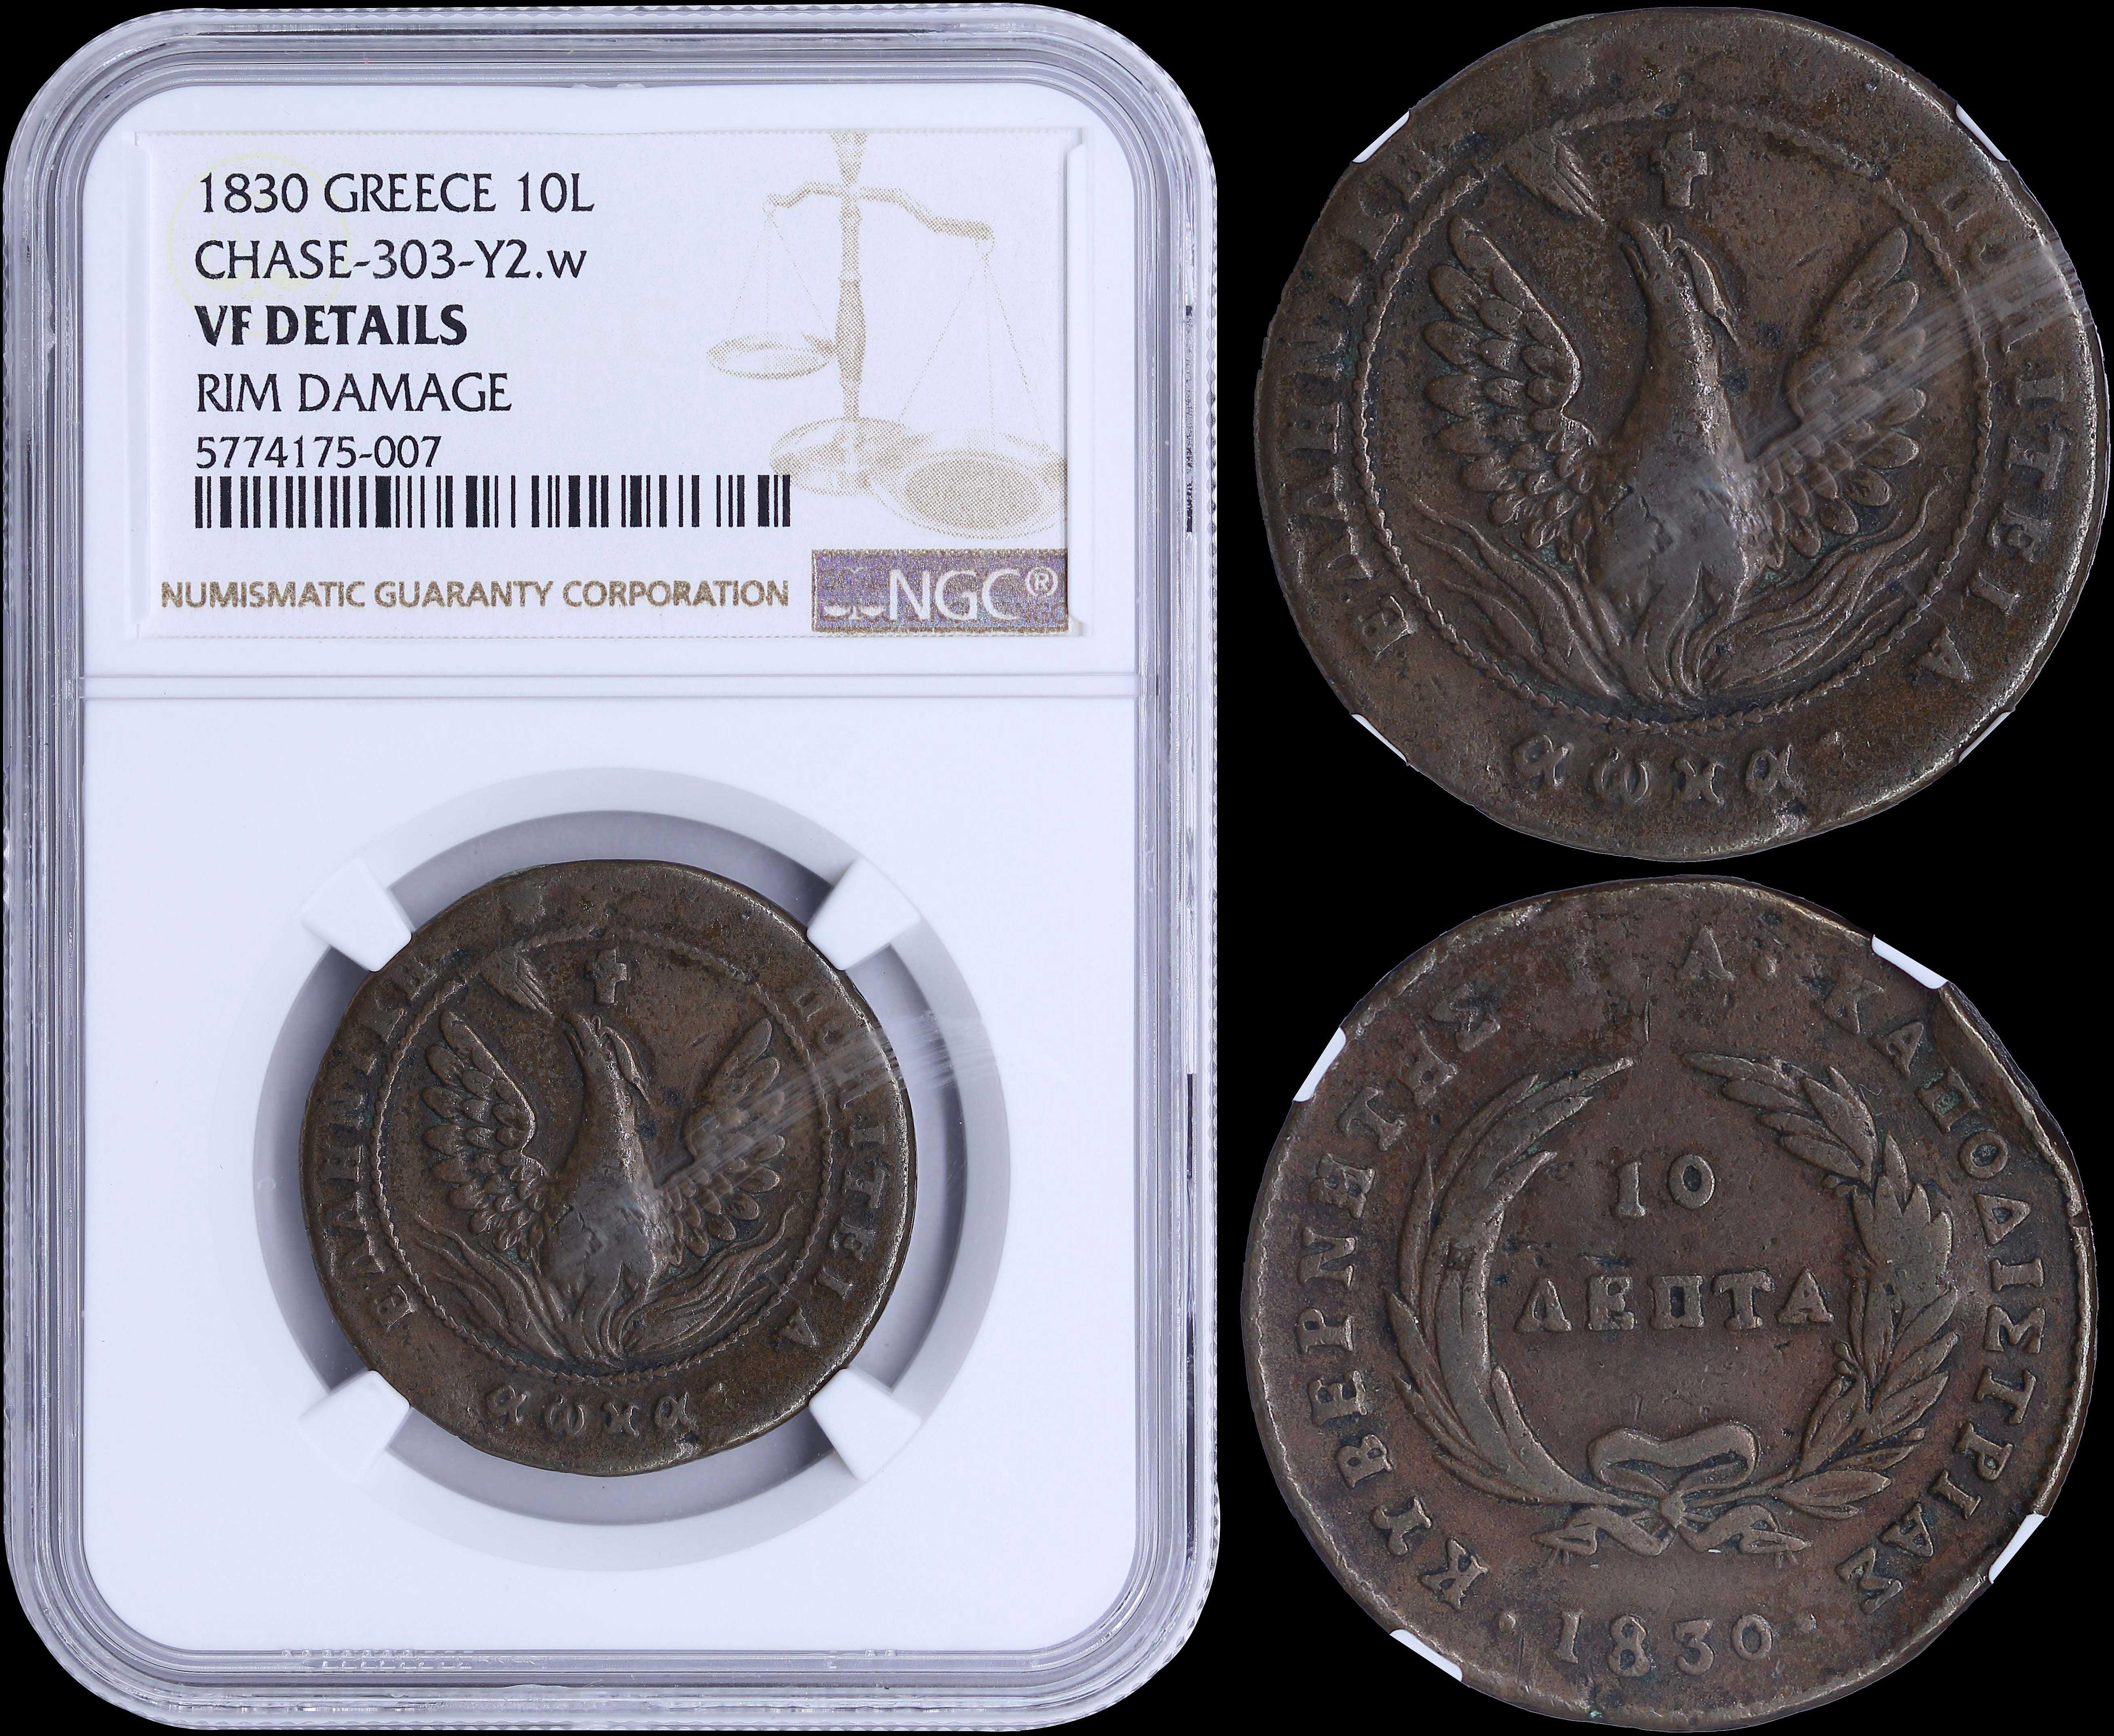 Lot 6017 - -  COINS & TOKENS governor capodistrias -  A. Karamitsos Public & Live Internet Auction 682 (Part A) Coins, Medals & Banknotes